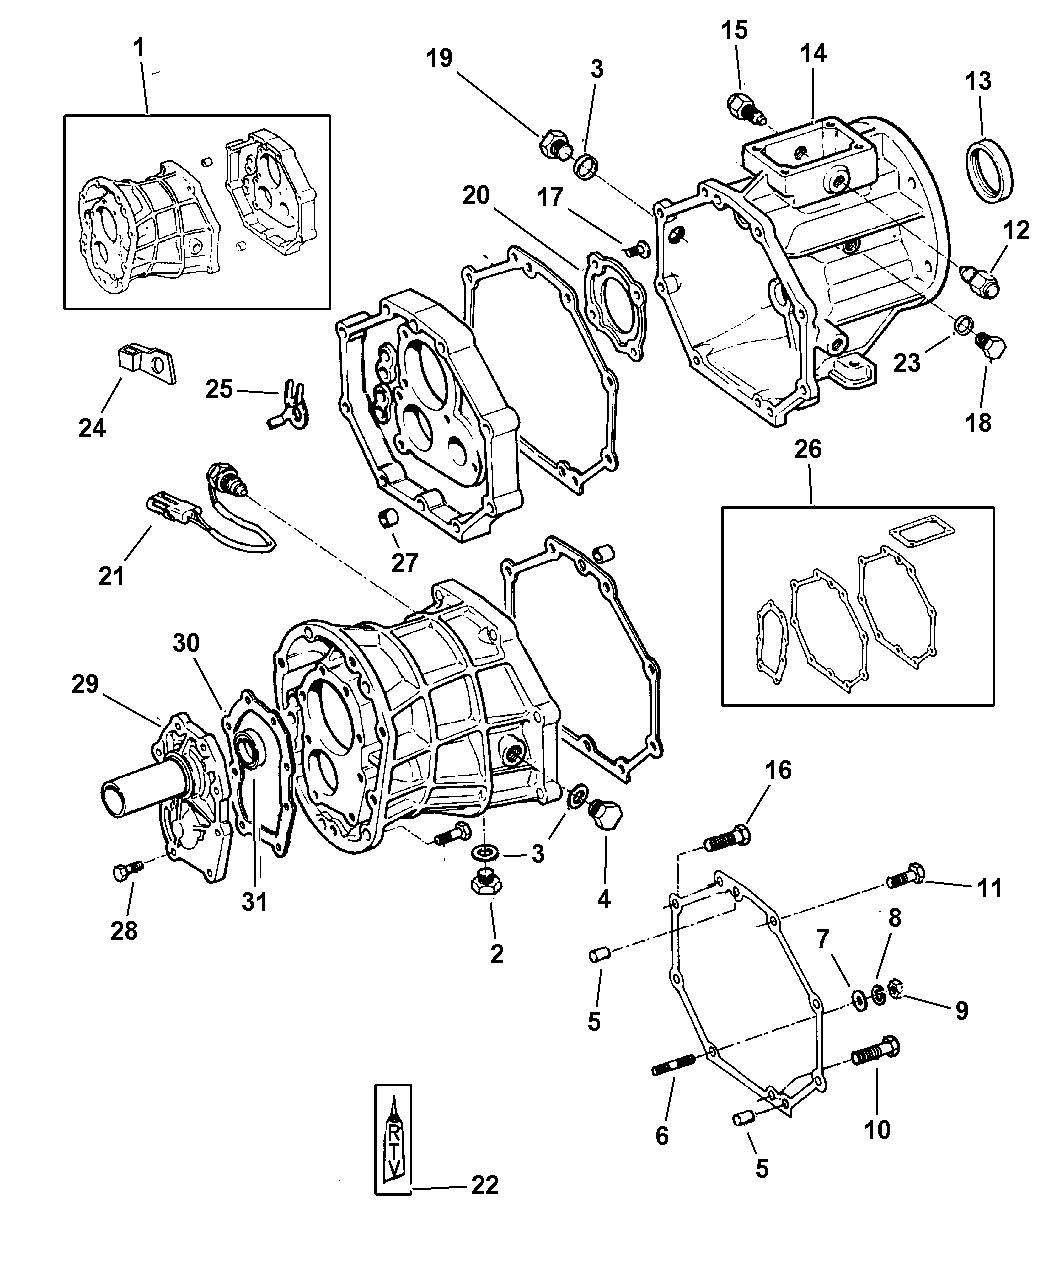 1997 Jeep Wrangler Transmission Diagram Wiring Diagram New Dare Gento A Dare Gento A Weimaranerzampadargento It